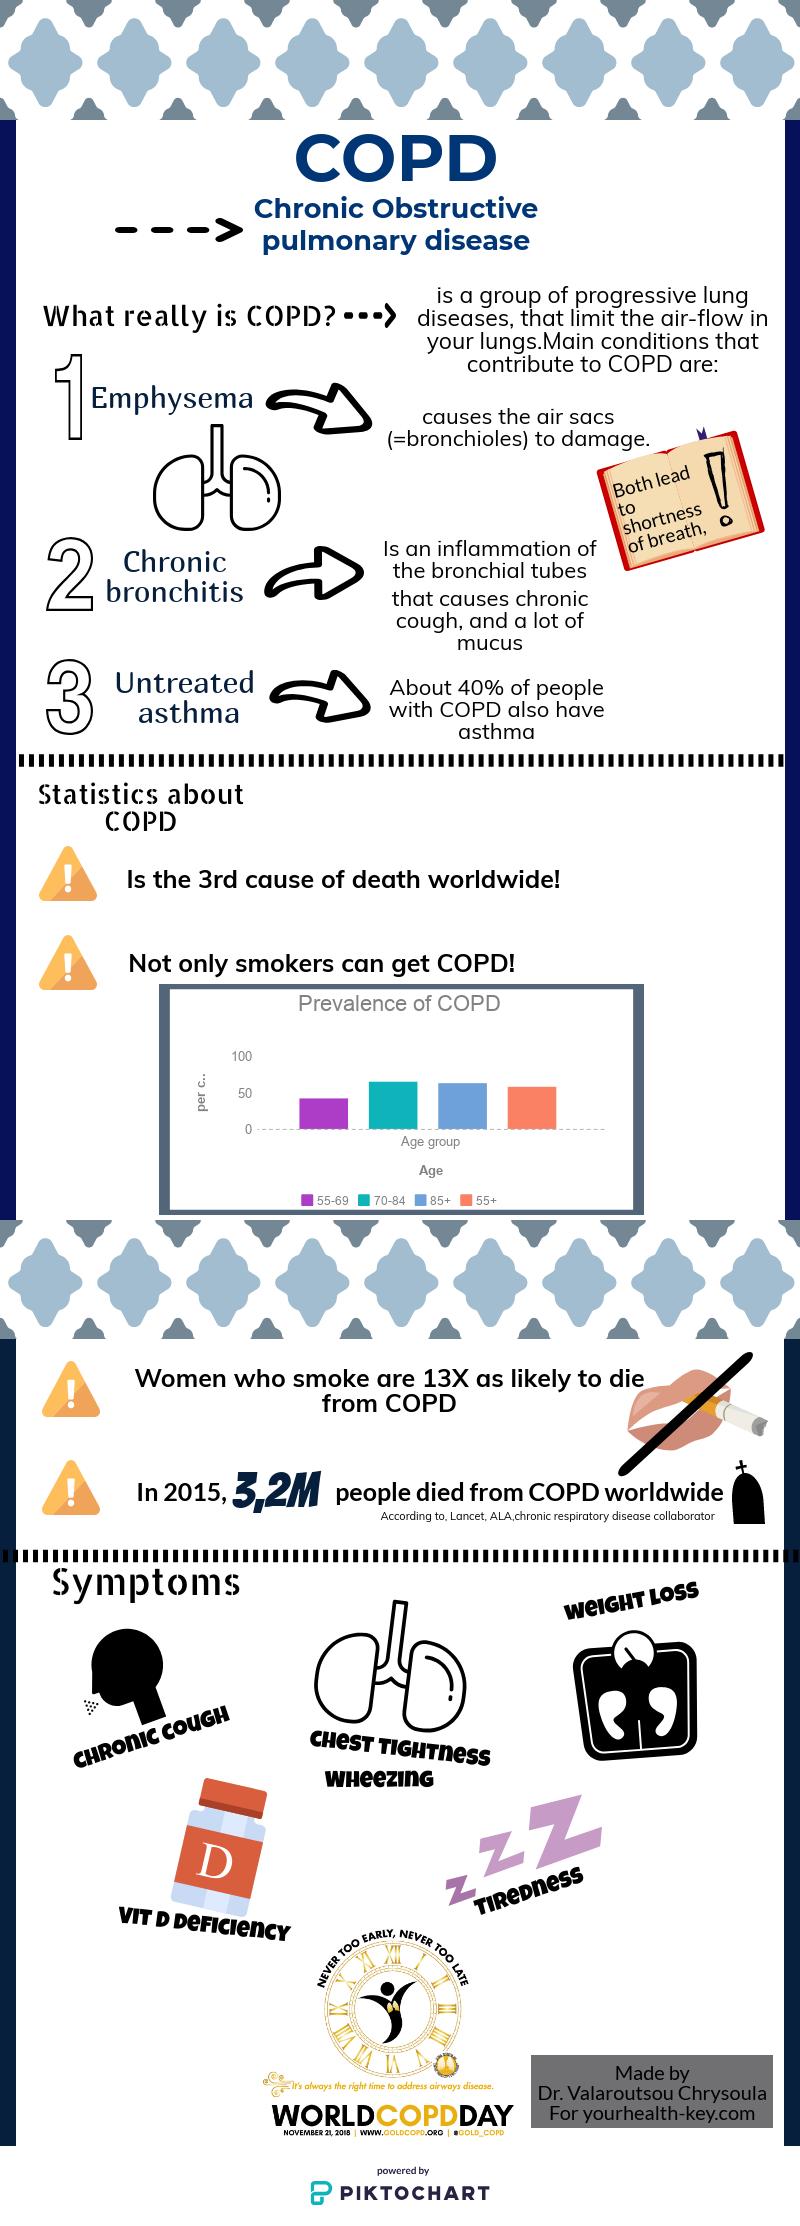 Chronic Obstructive Pulmonary Disease COPD 21 november